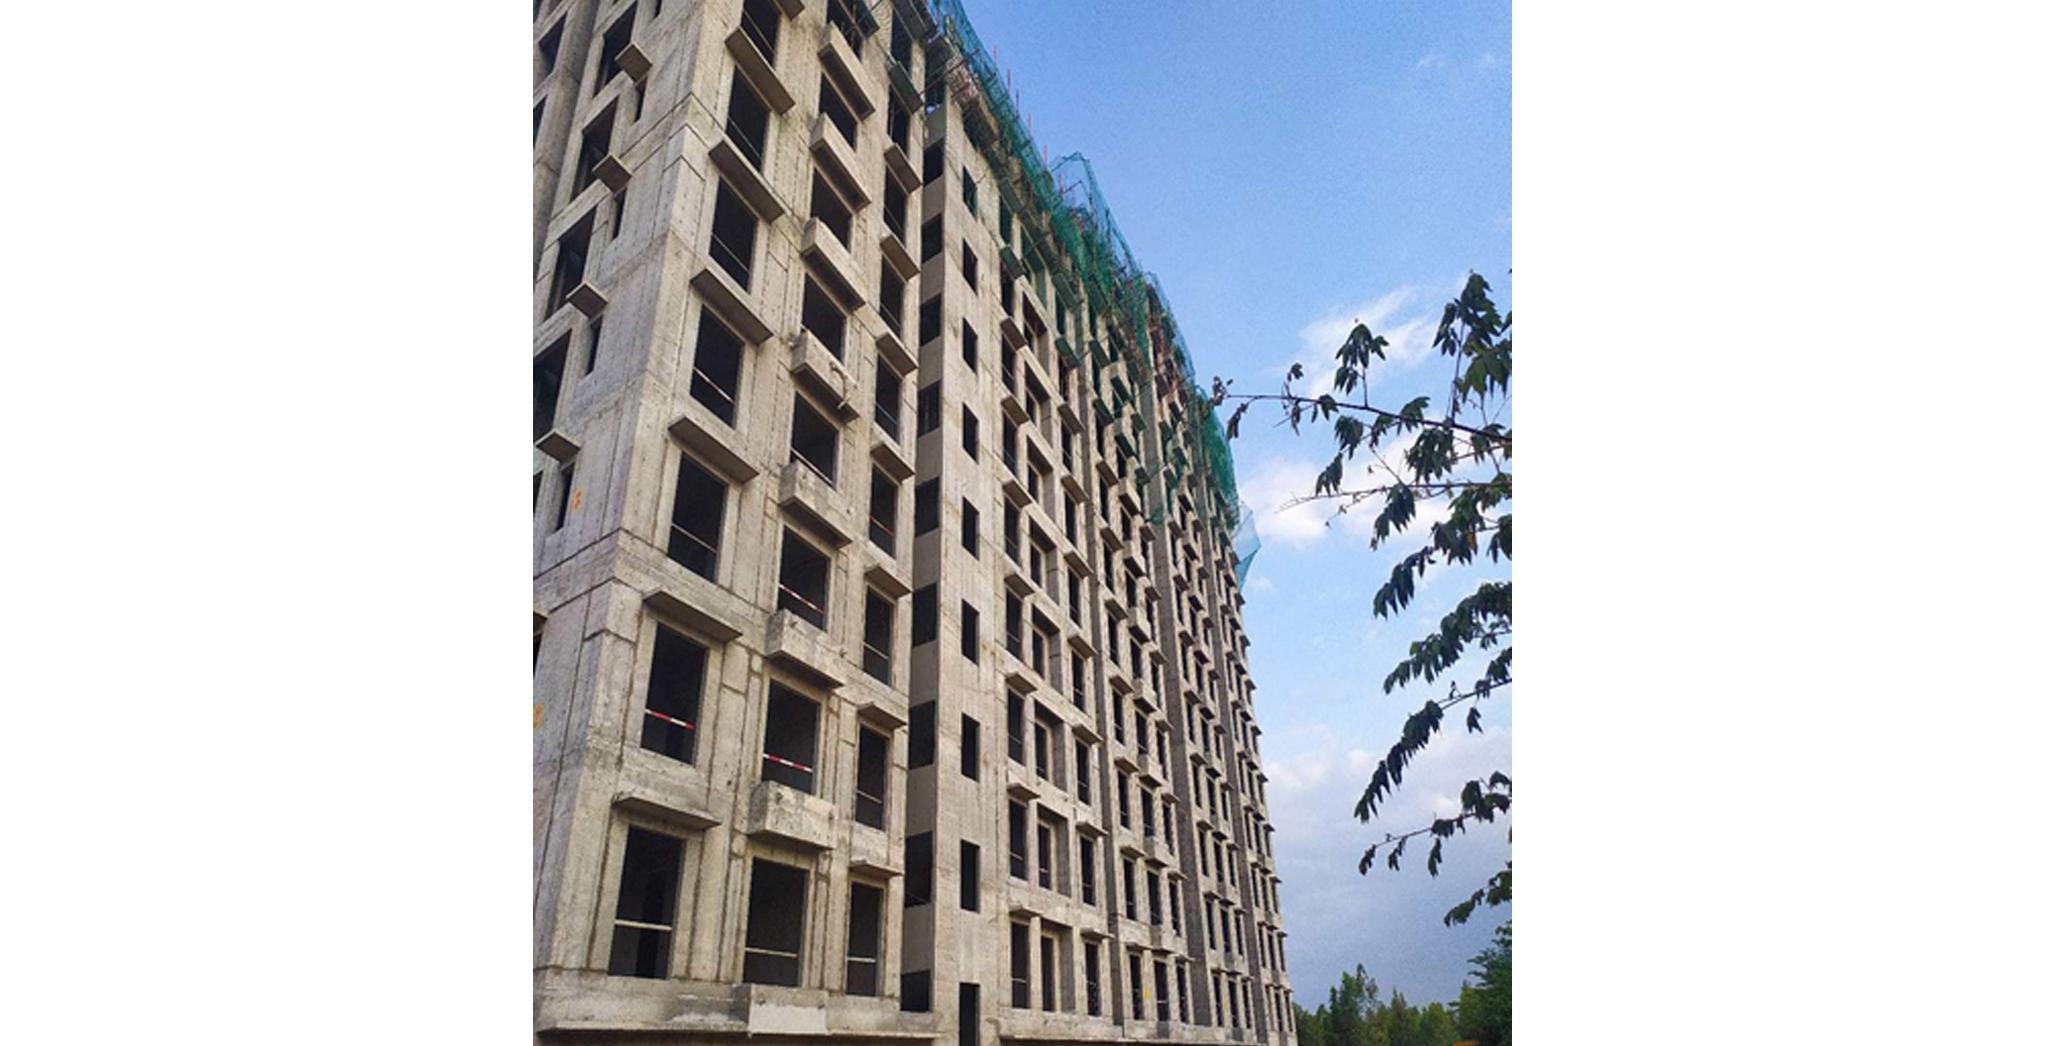 Aug 2021 - Helio Block: Wing C - East Elevation